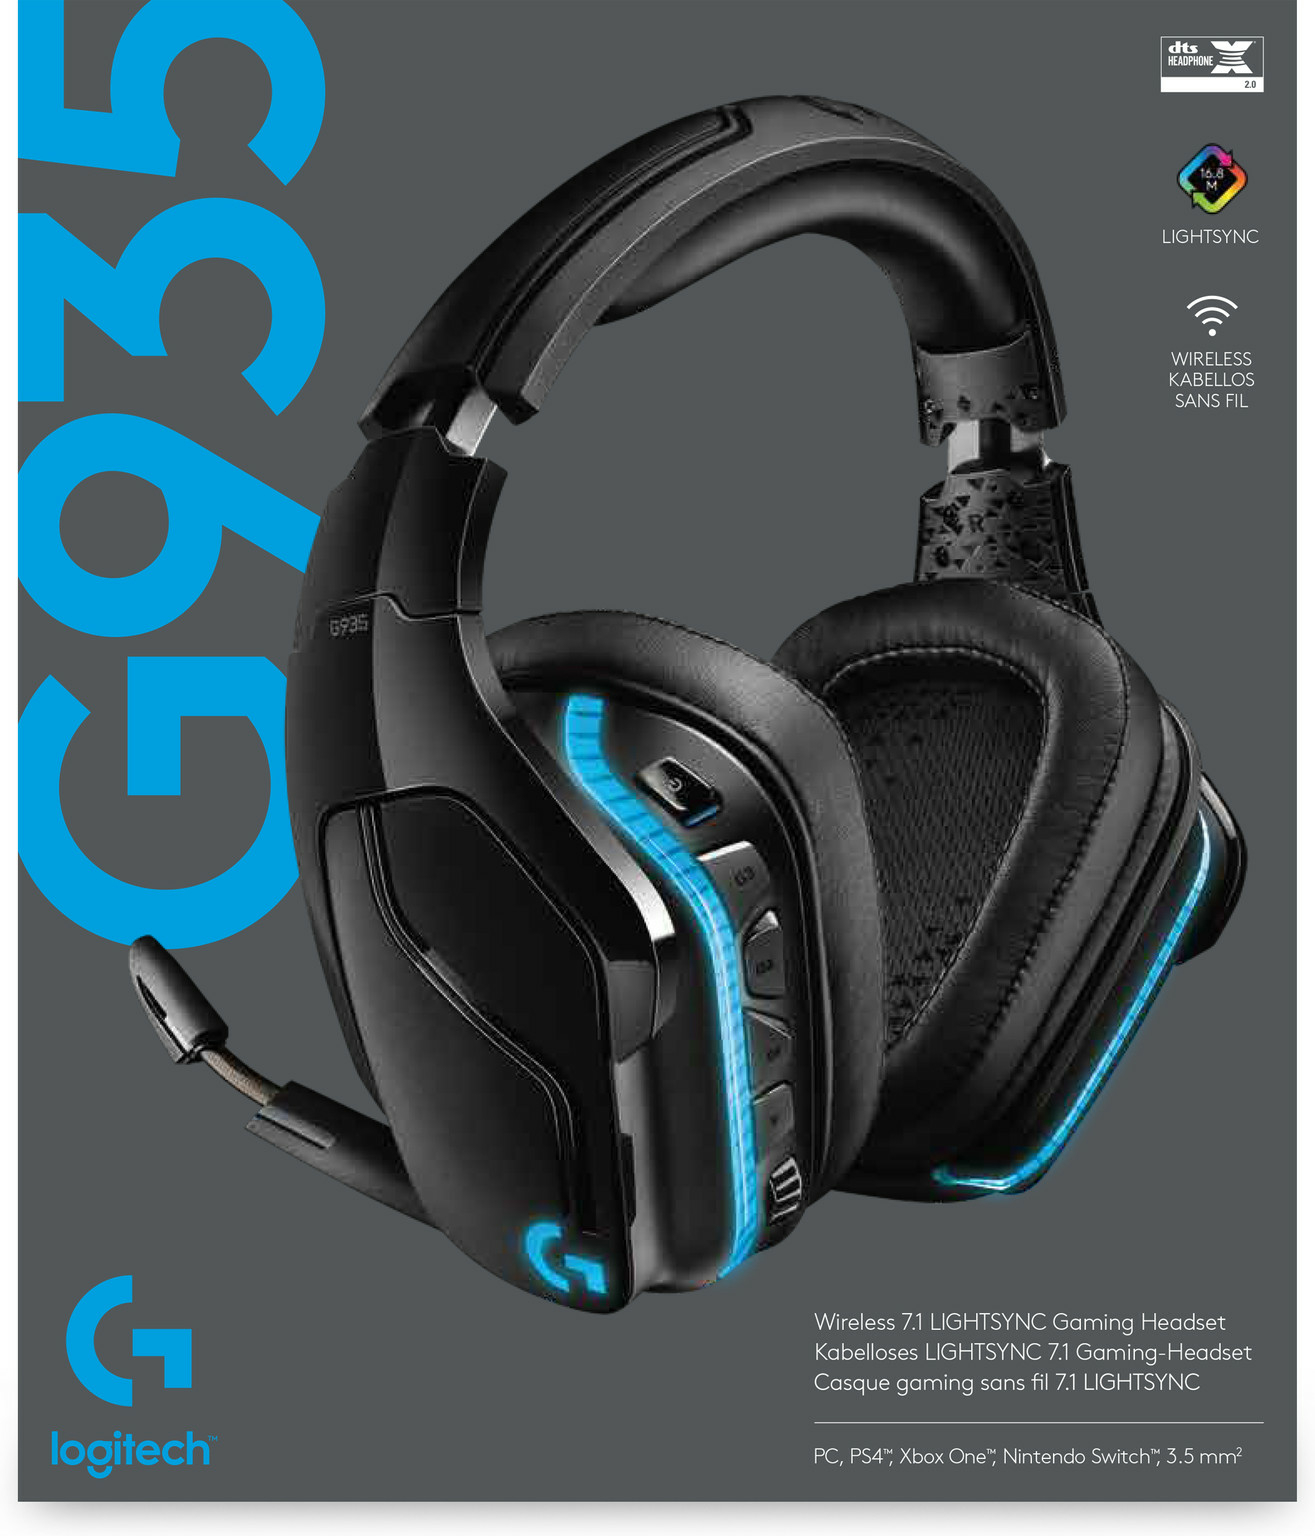 Review : Logitech G935 Surround LIGHTSYNC Gaming Headset